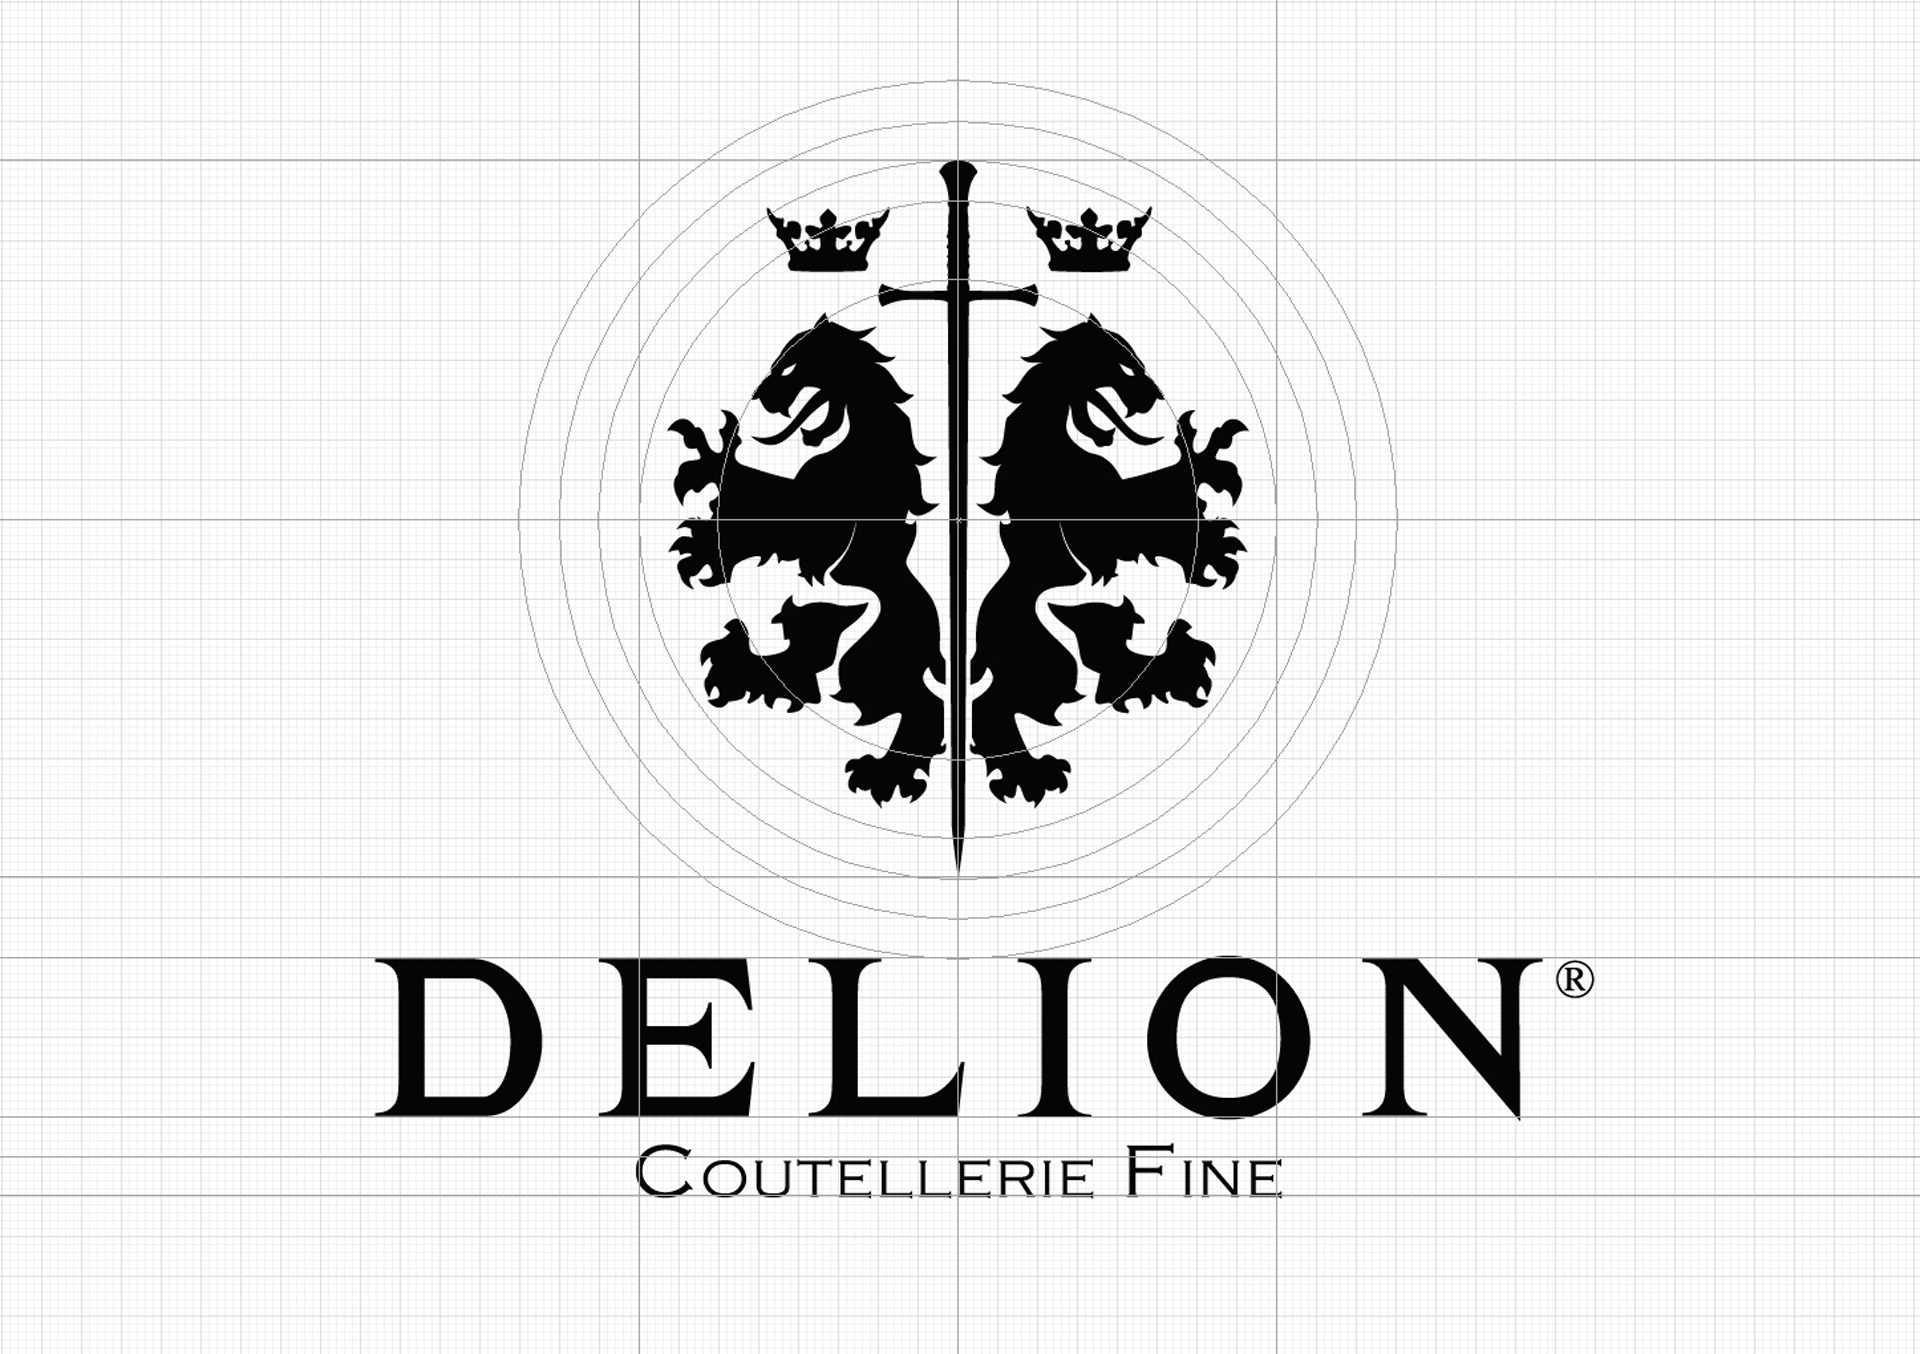 Construction of the Delion logo